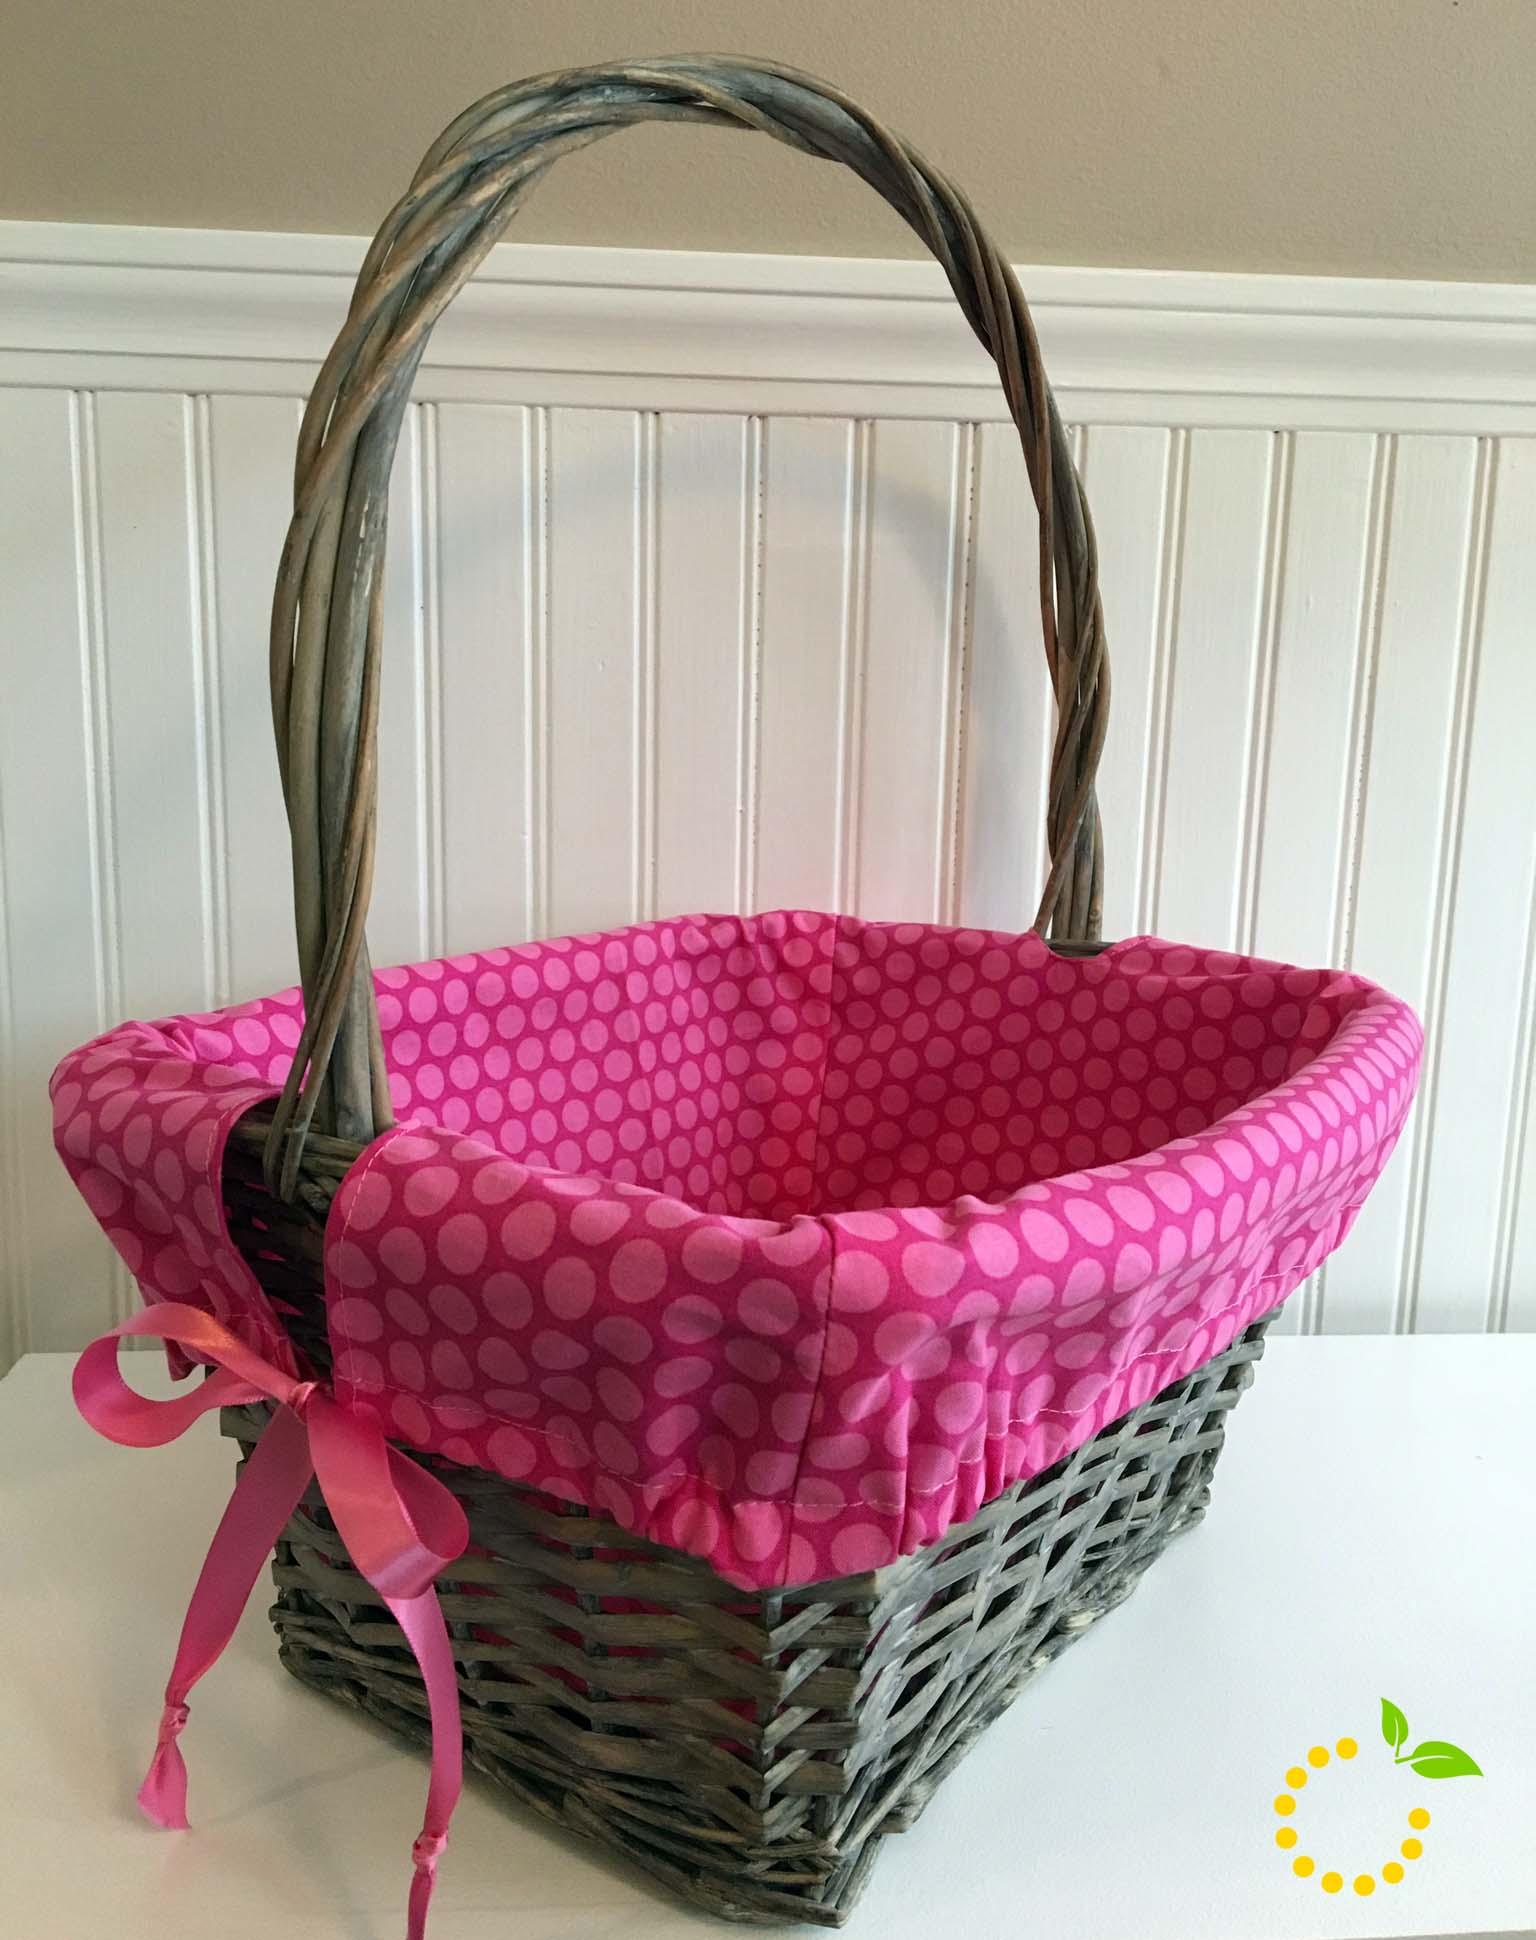 Fabric Lined Basket sweetlemonmade.com